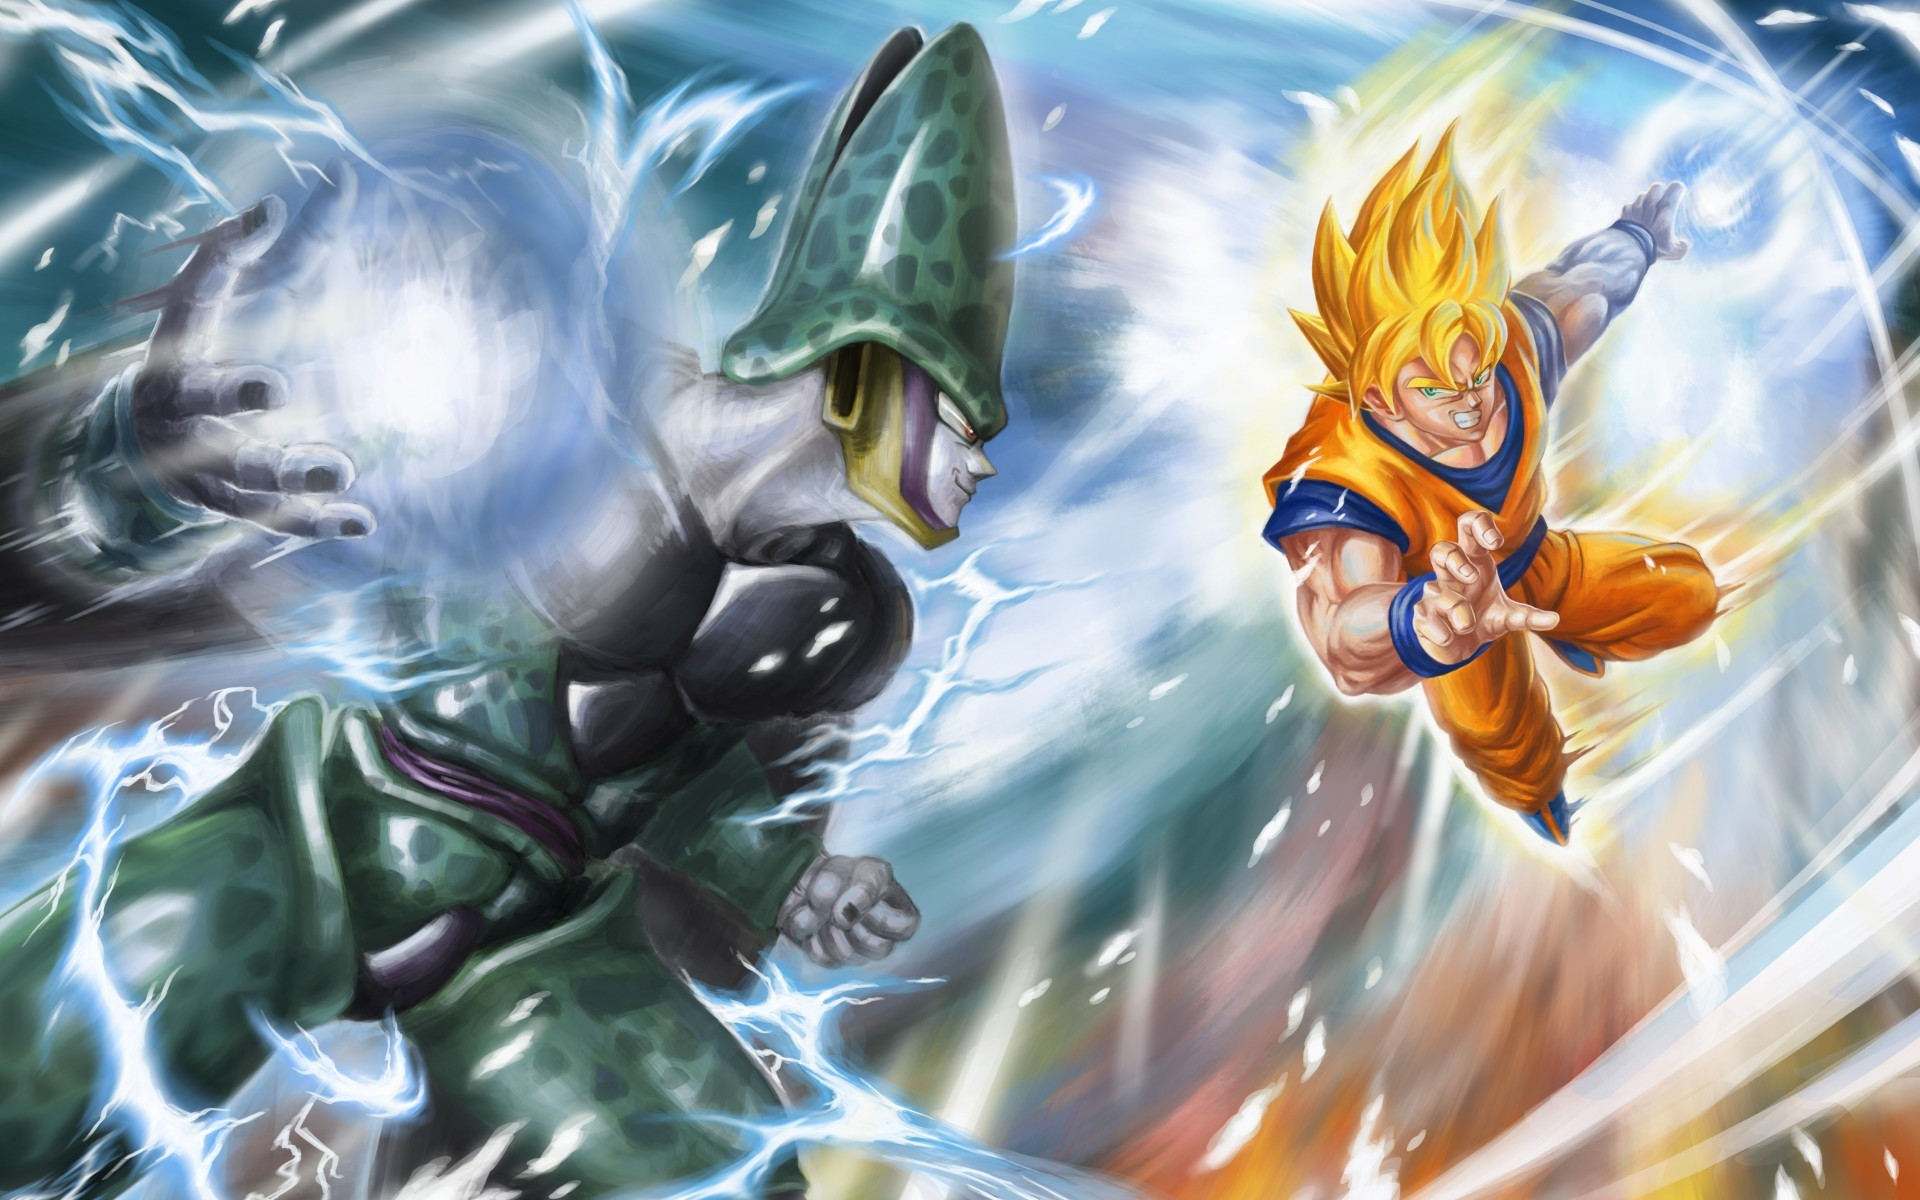 Goku Ssj Wallpaper Hd Goku Vs Broly Wallpaper 61 Images